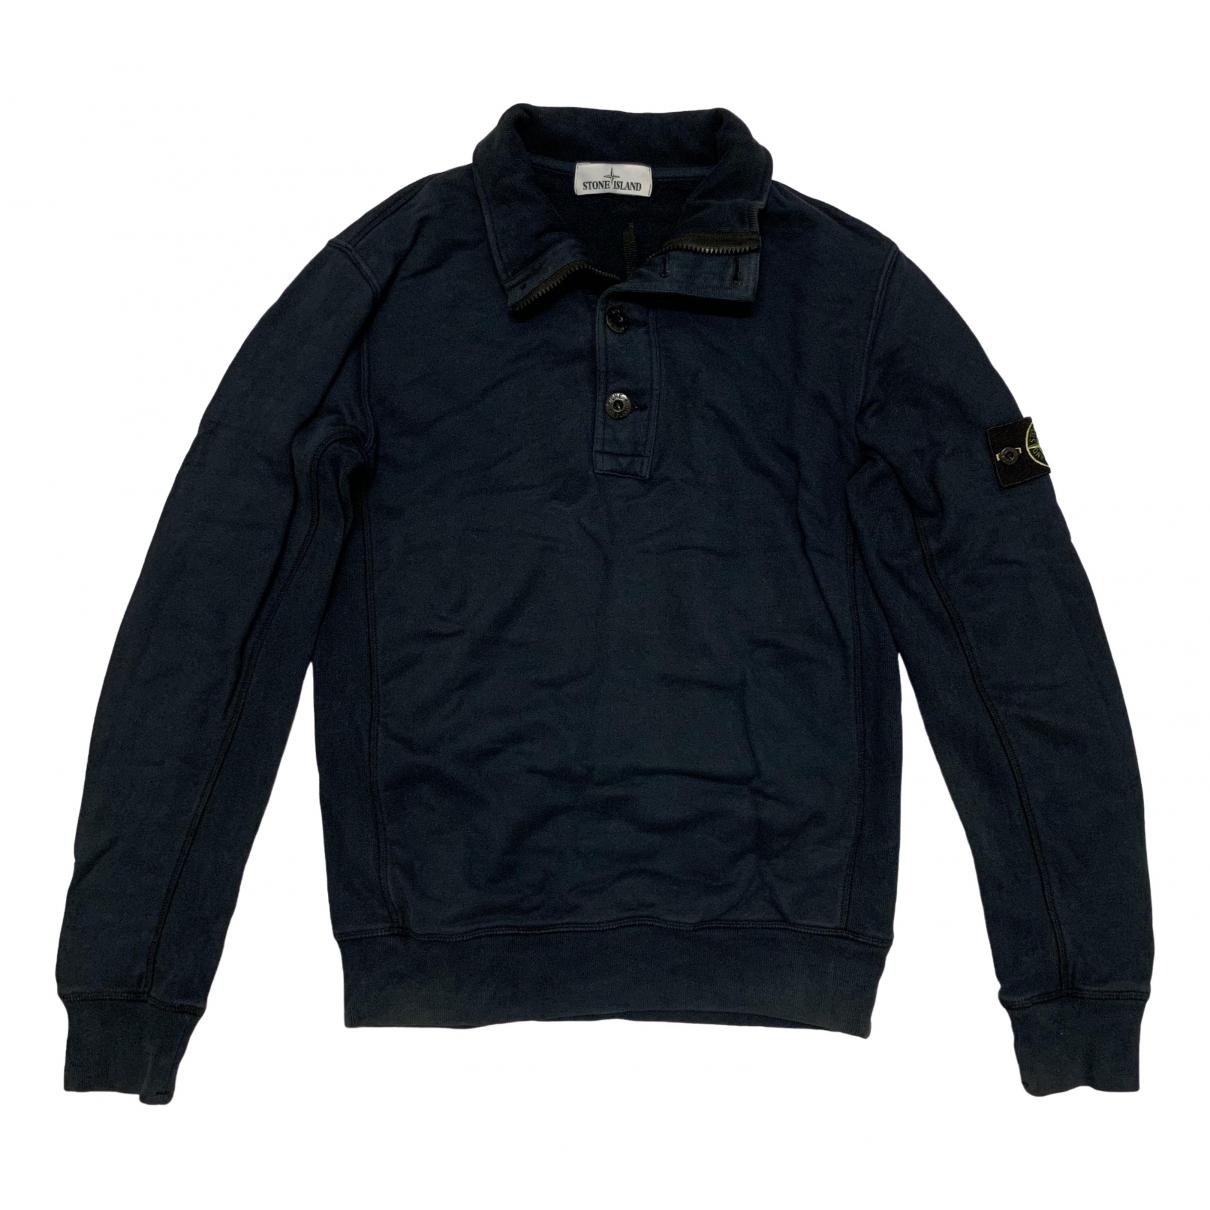 Stone Island \N Navy Cotton Knitwear & Sweatshirts for Men M International